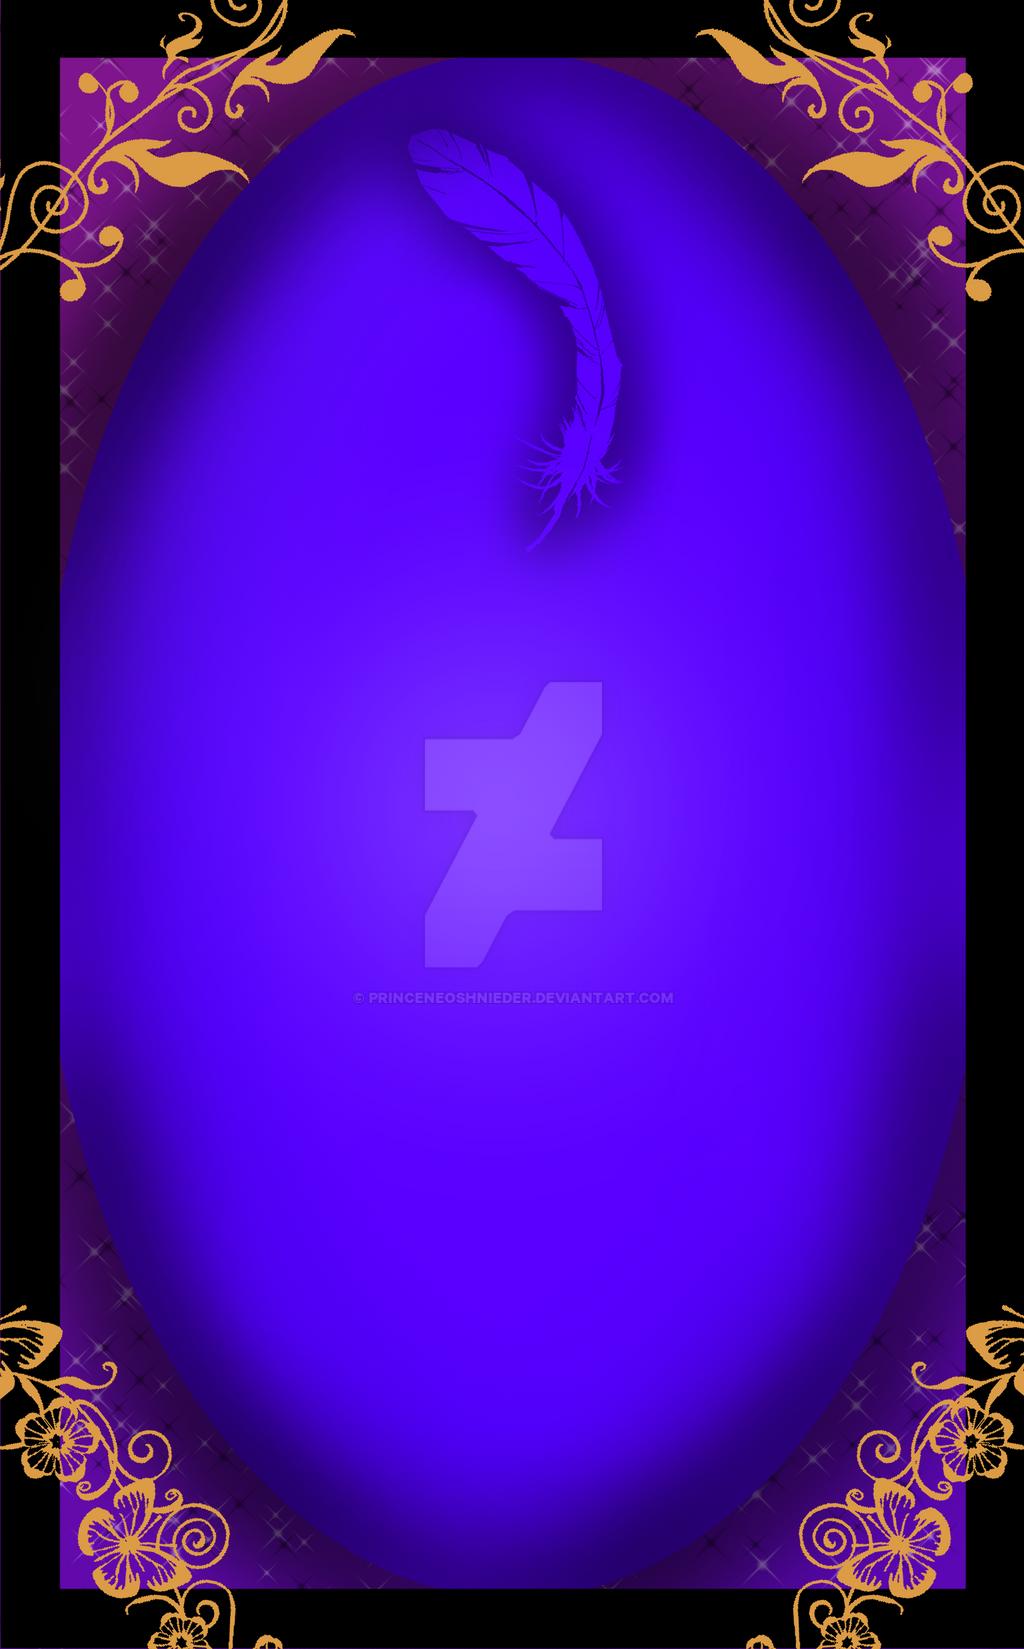 Tarot Card Base by PrinceNeoShnieder